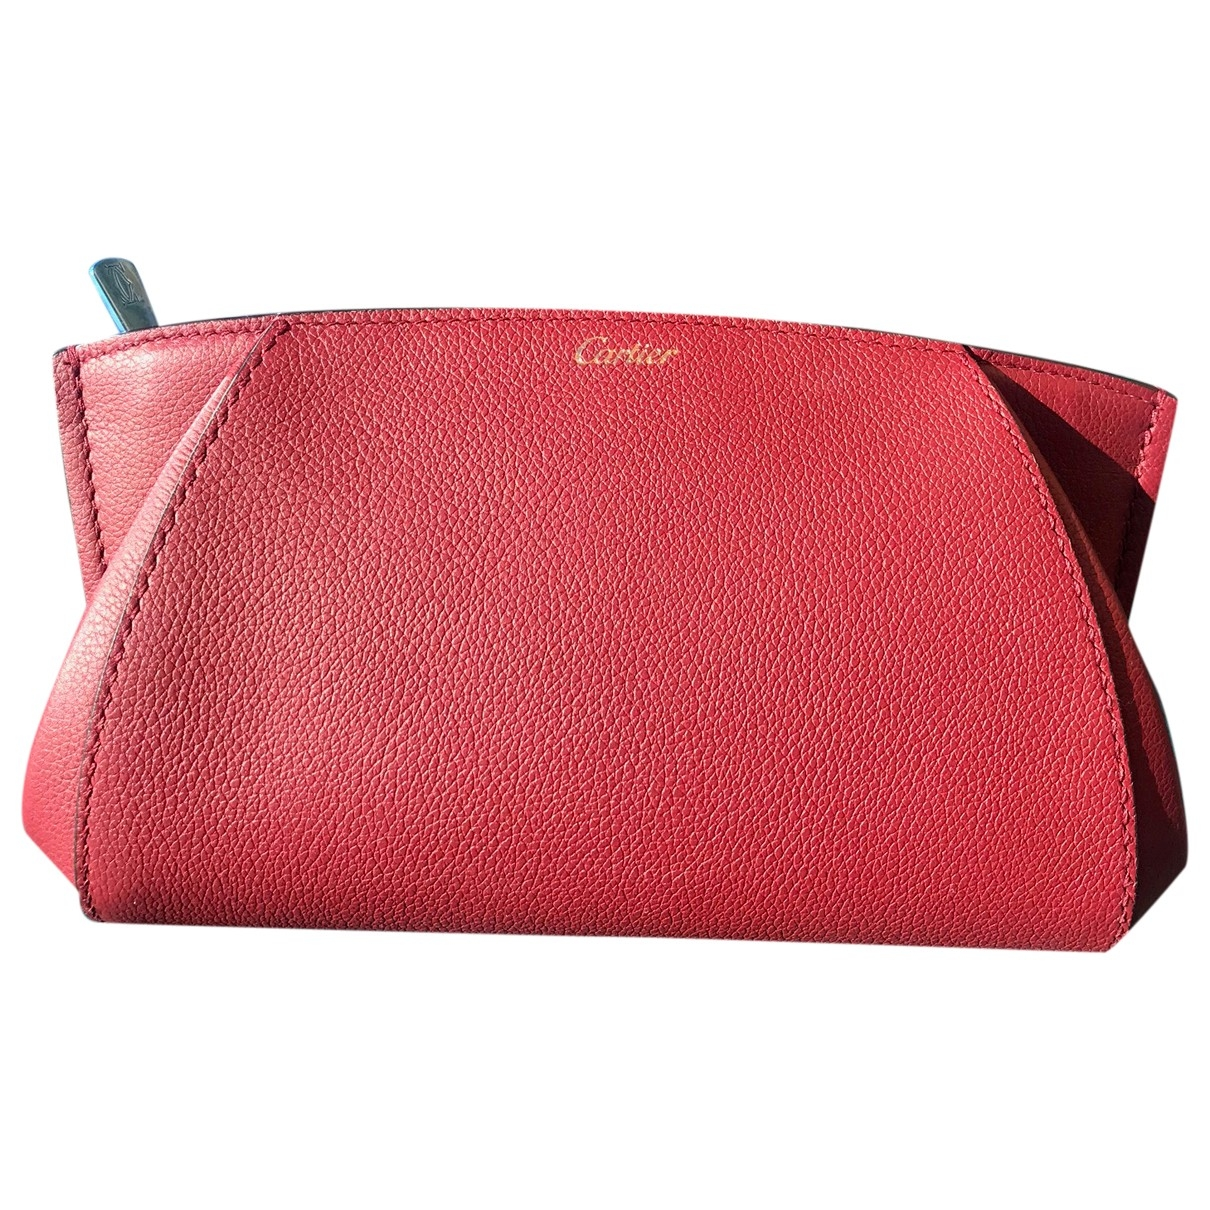 Cartier C Clutch in  Rot Leder